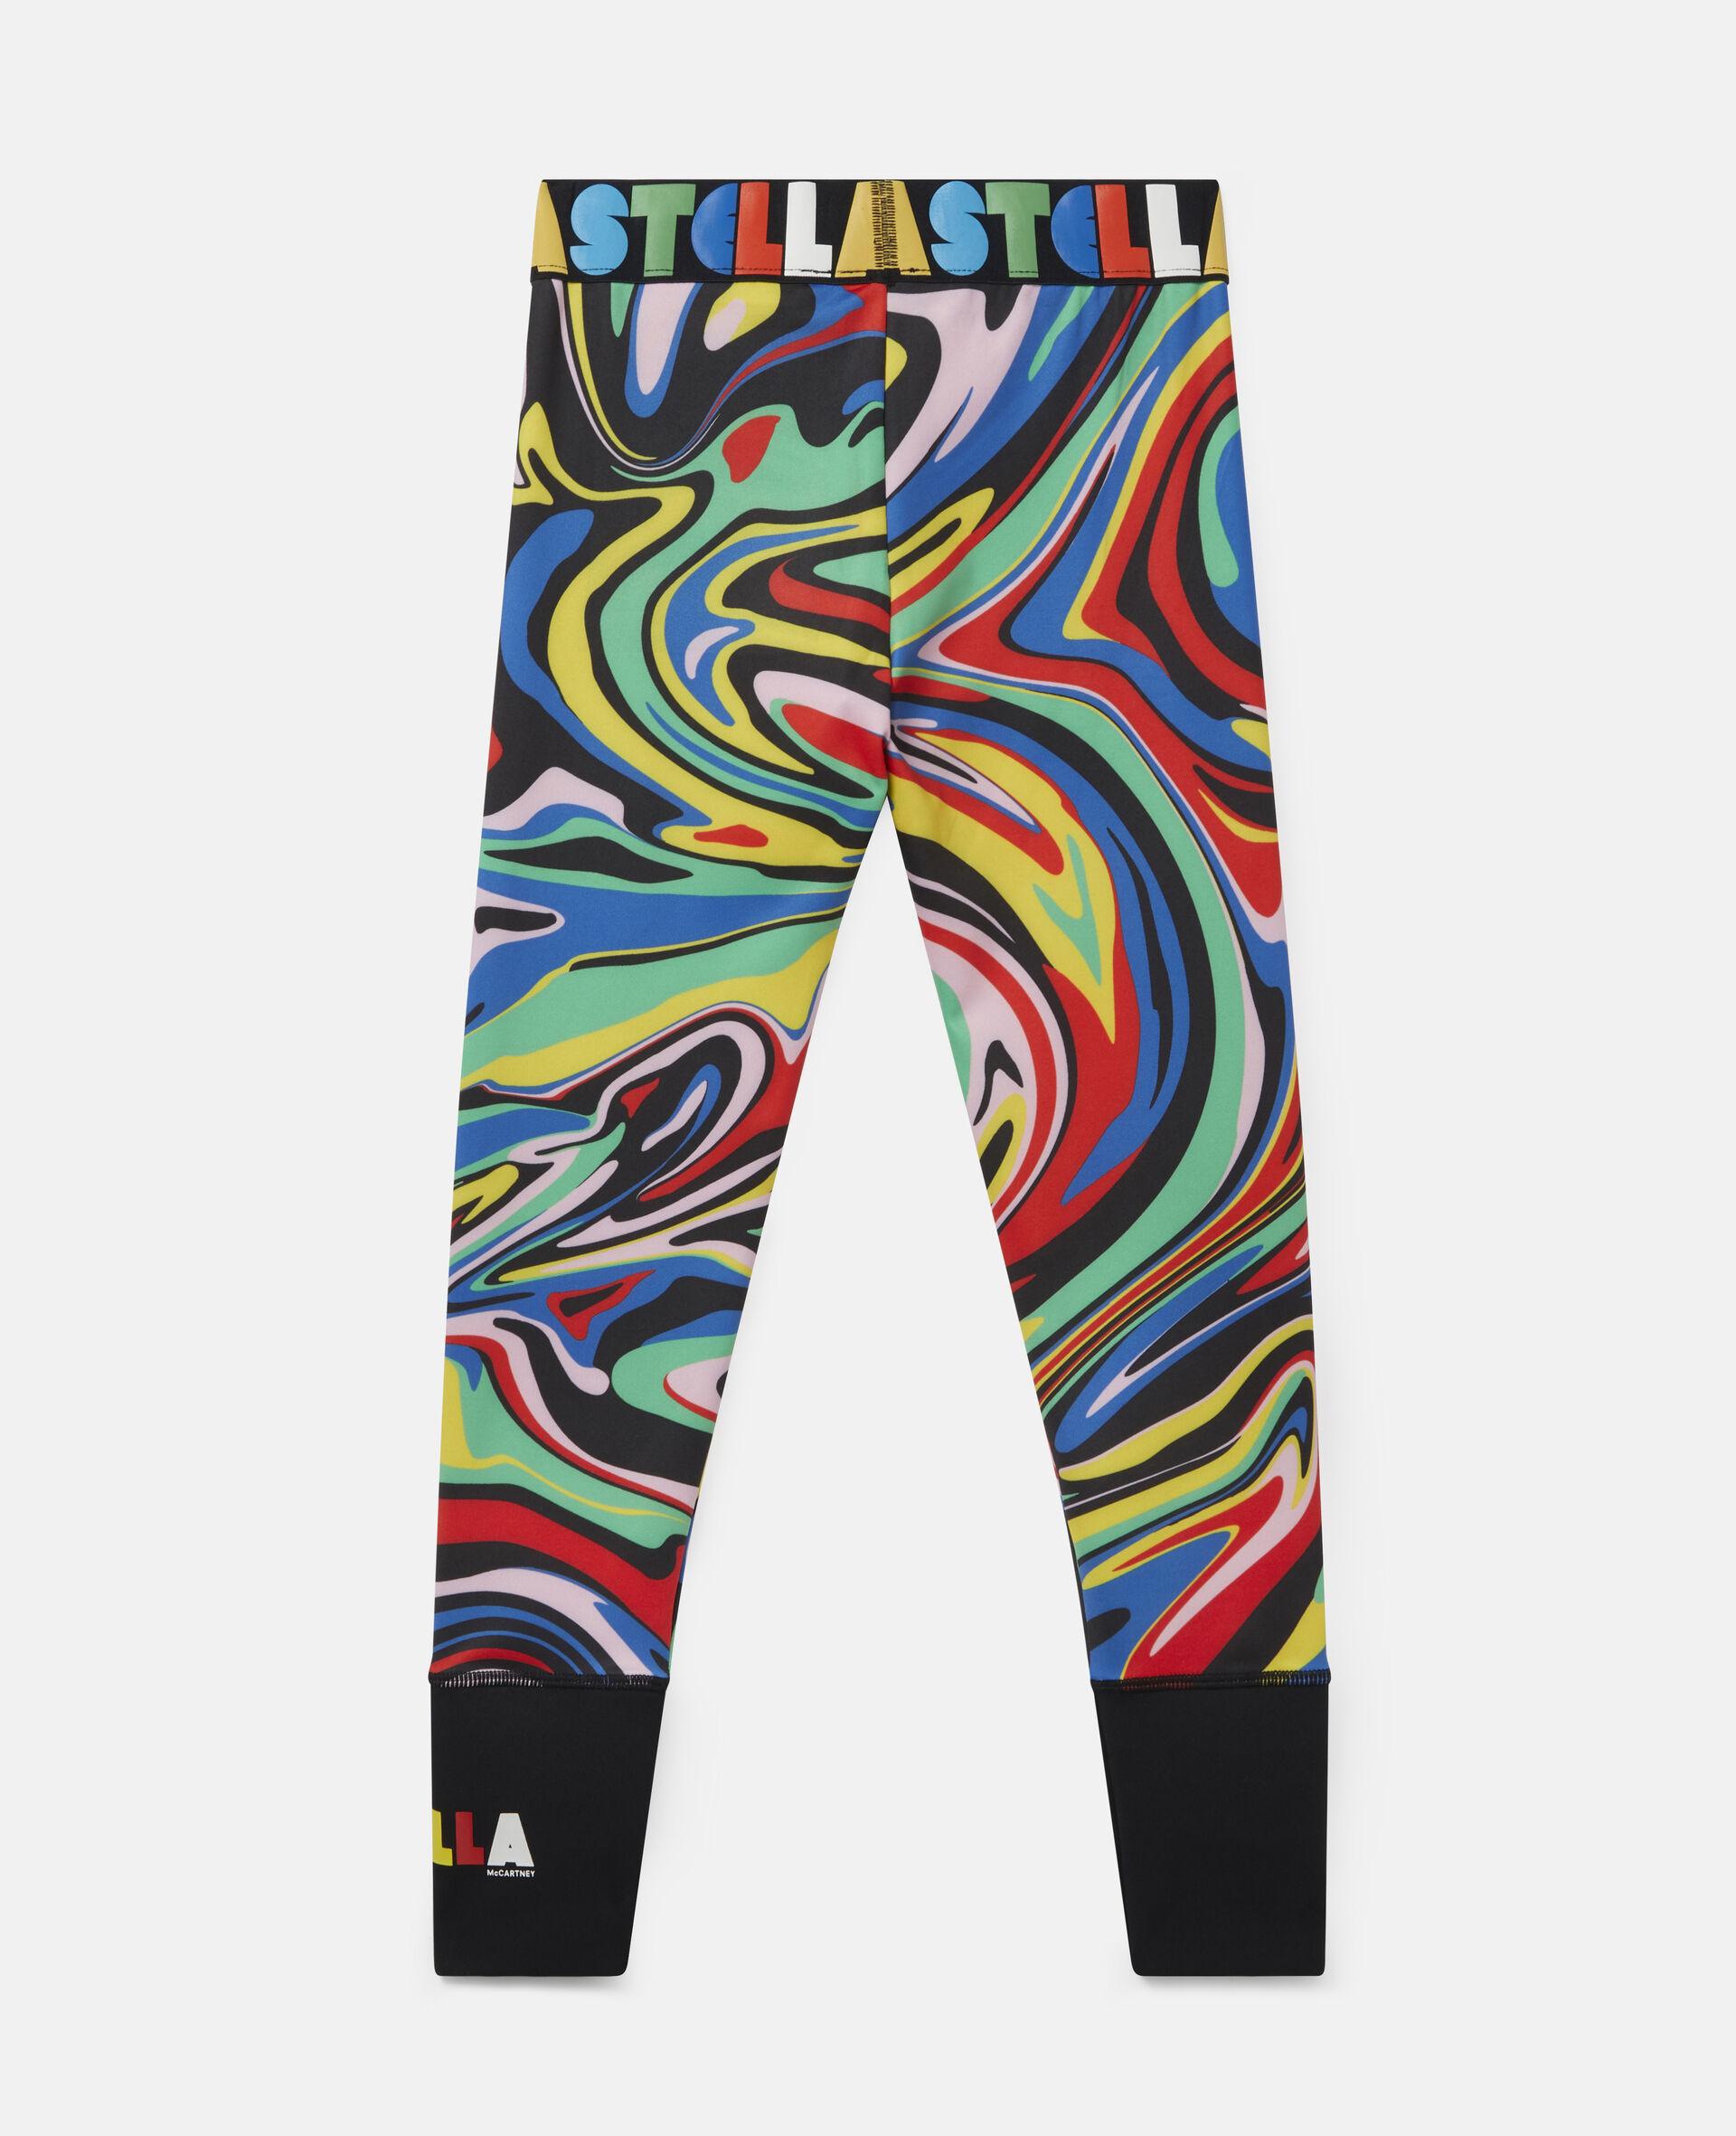 Legging sportif motif marbré -Fantaisie-large image number 3